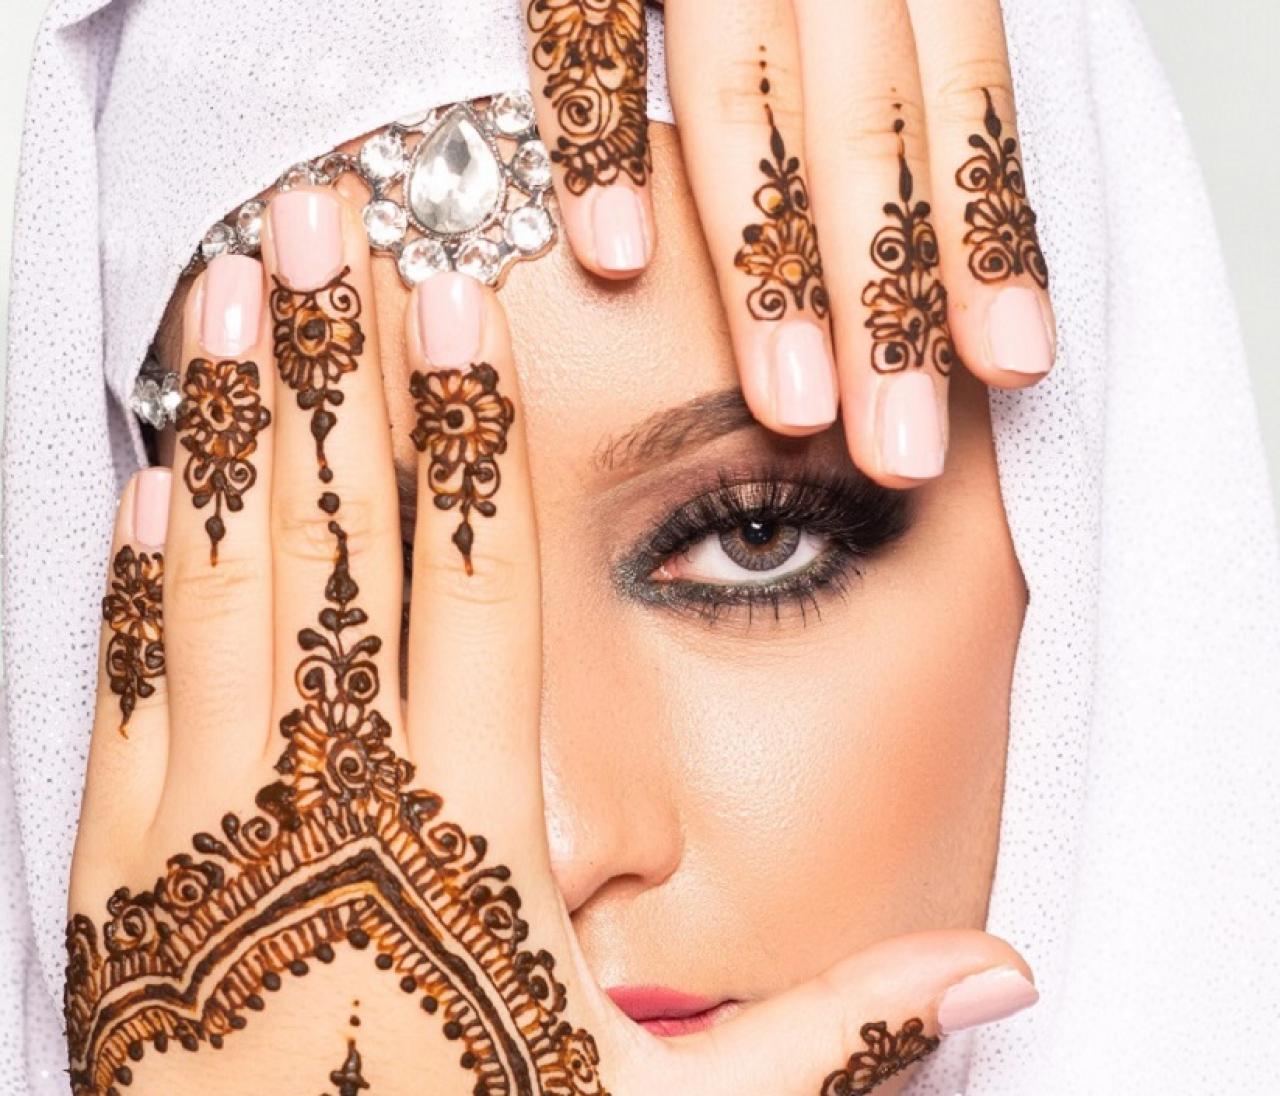 Kaoutar Azzahchi maakt bruidsversieringen met henna